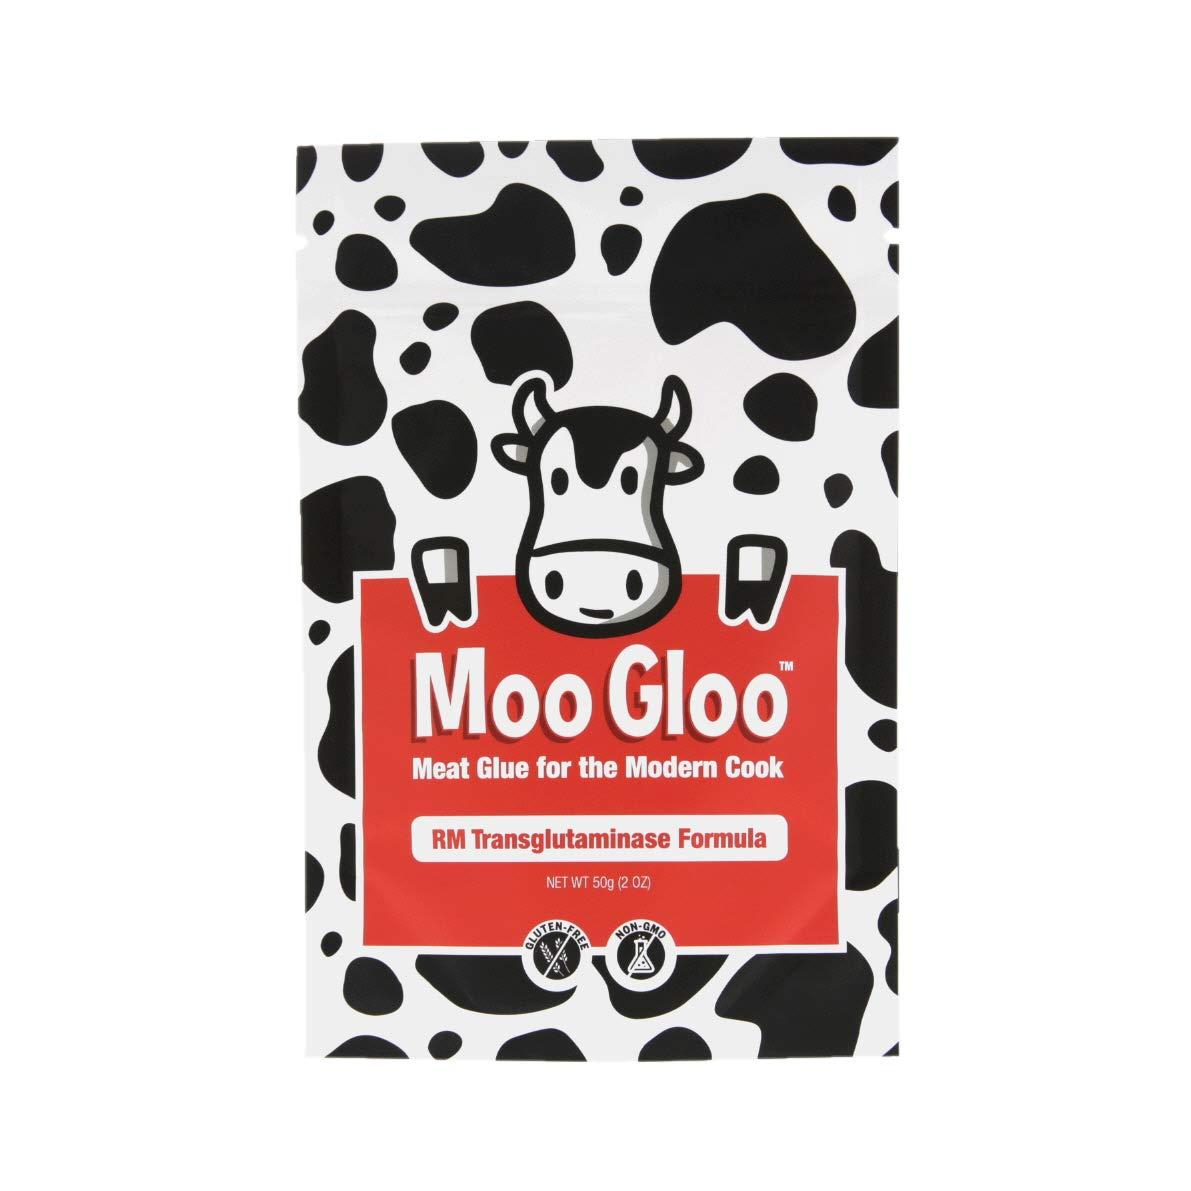 Moo Gloo Transglutaminase [TG, Meat Glue] - RM Formula - 50g/2oz